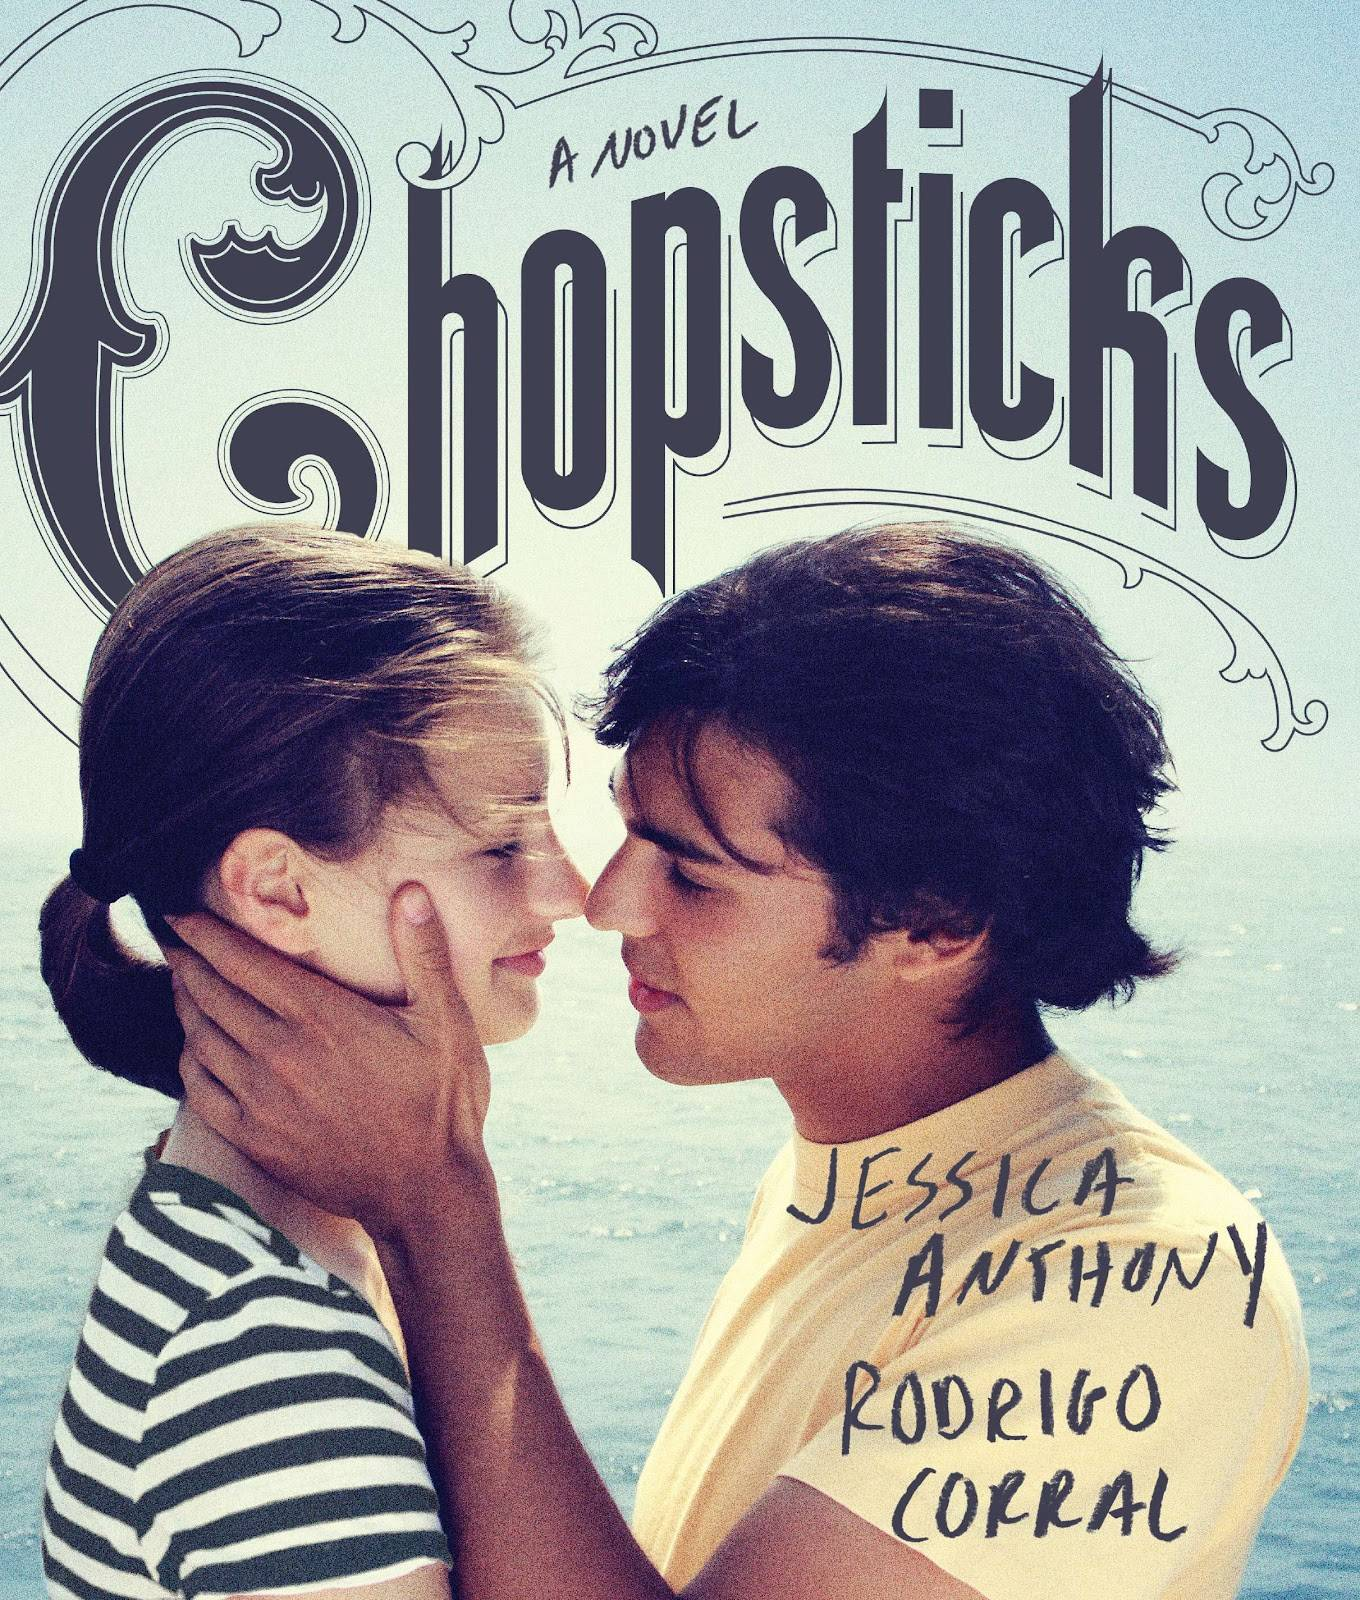 Chopsticks. By Jessica Anthony and Rodrigo Corral